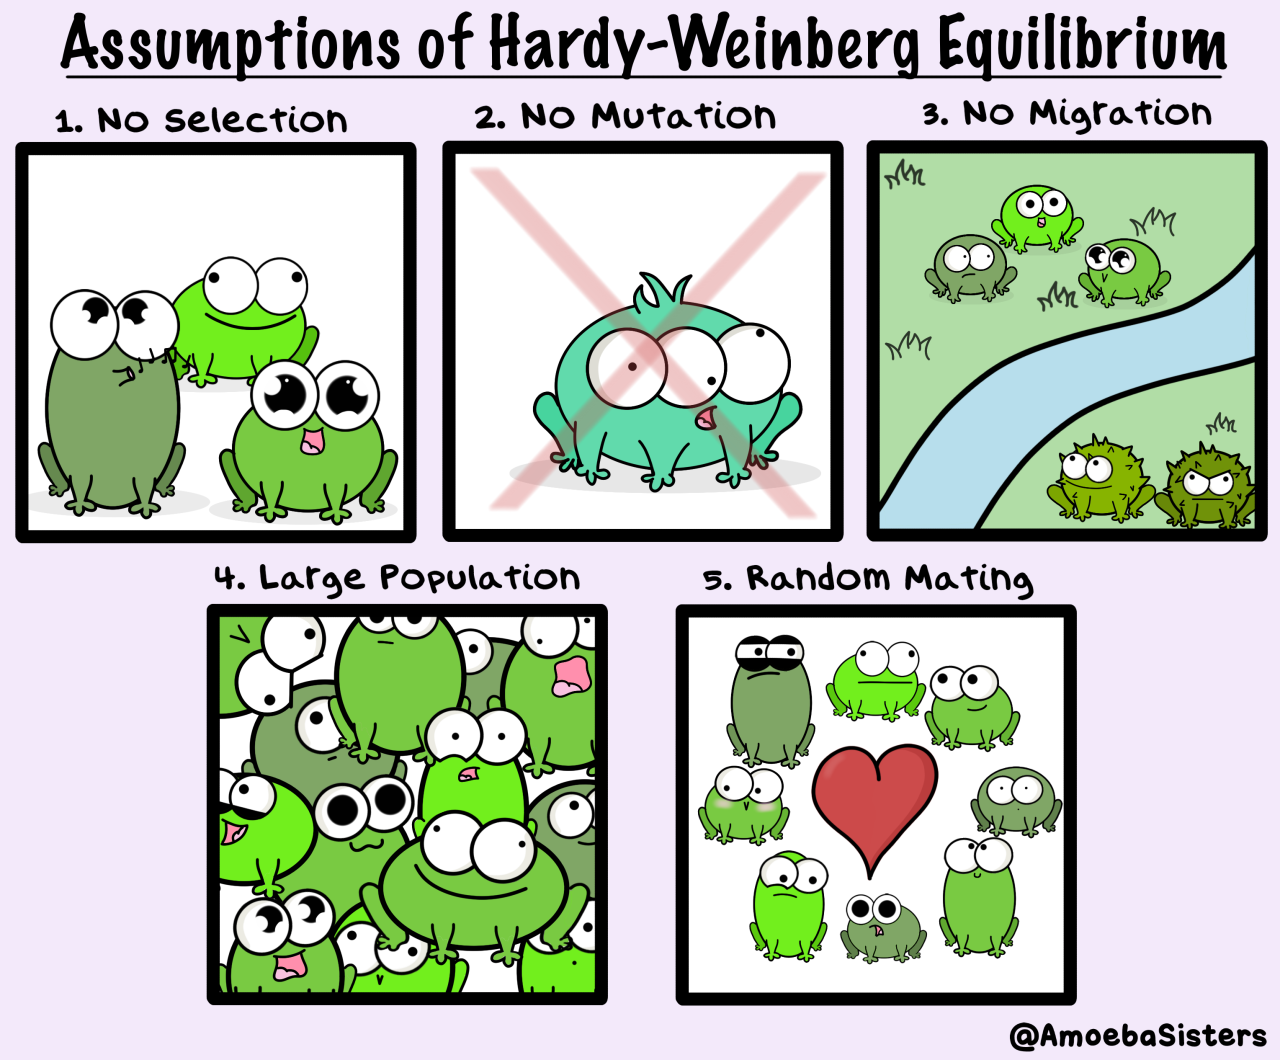 Hardy Weinberg Equilibrium Assumptions The Paramecium Parlor